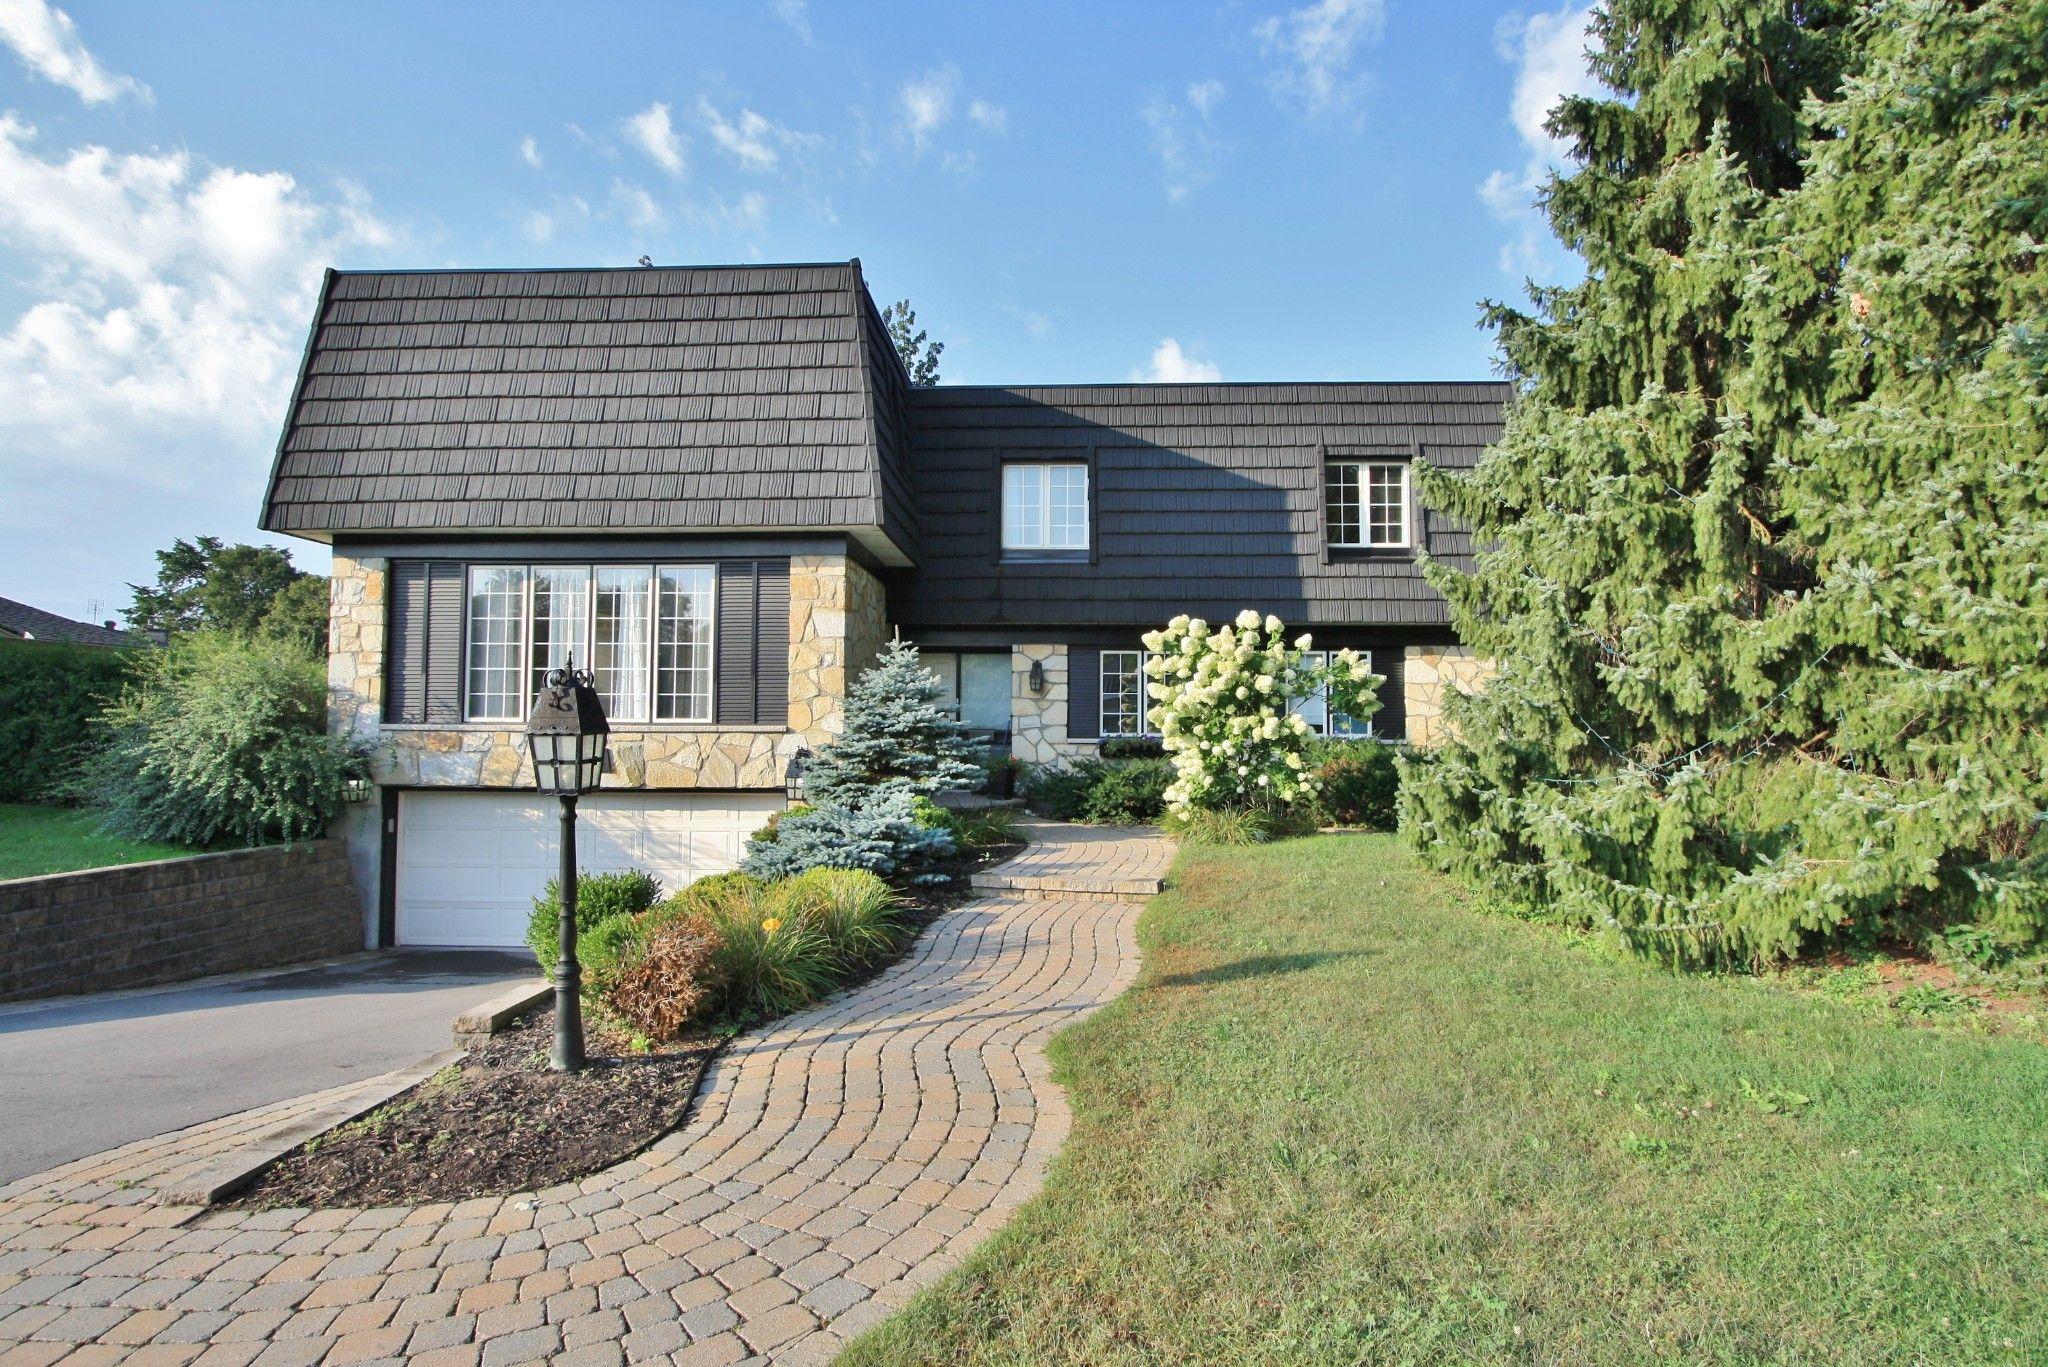 Main Photo:  in Ottawa: House for sale (Rothwell Ridge)